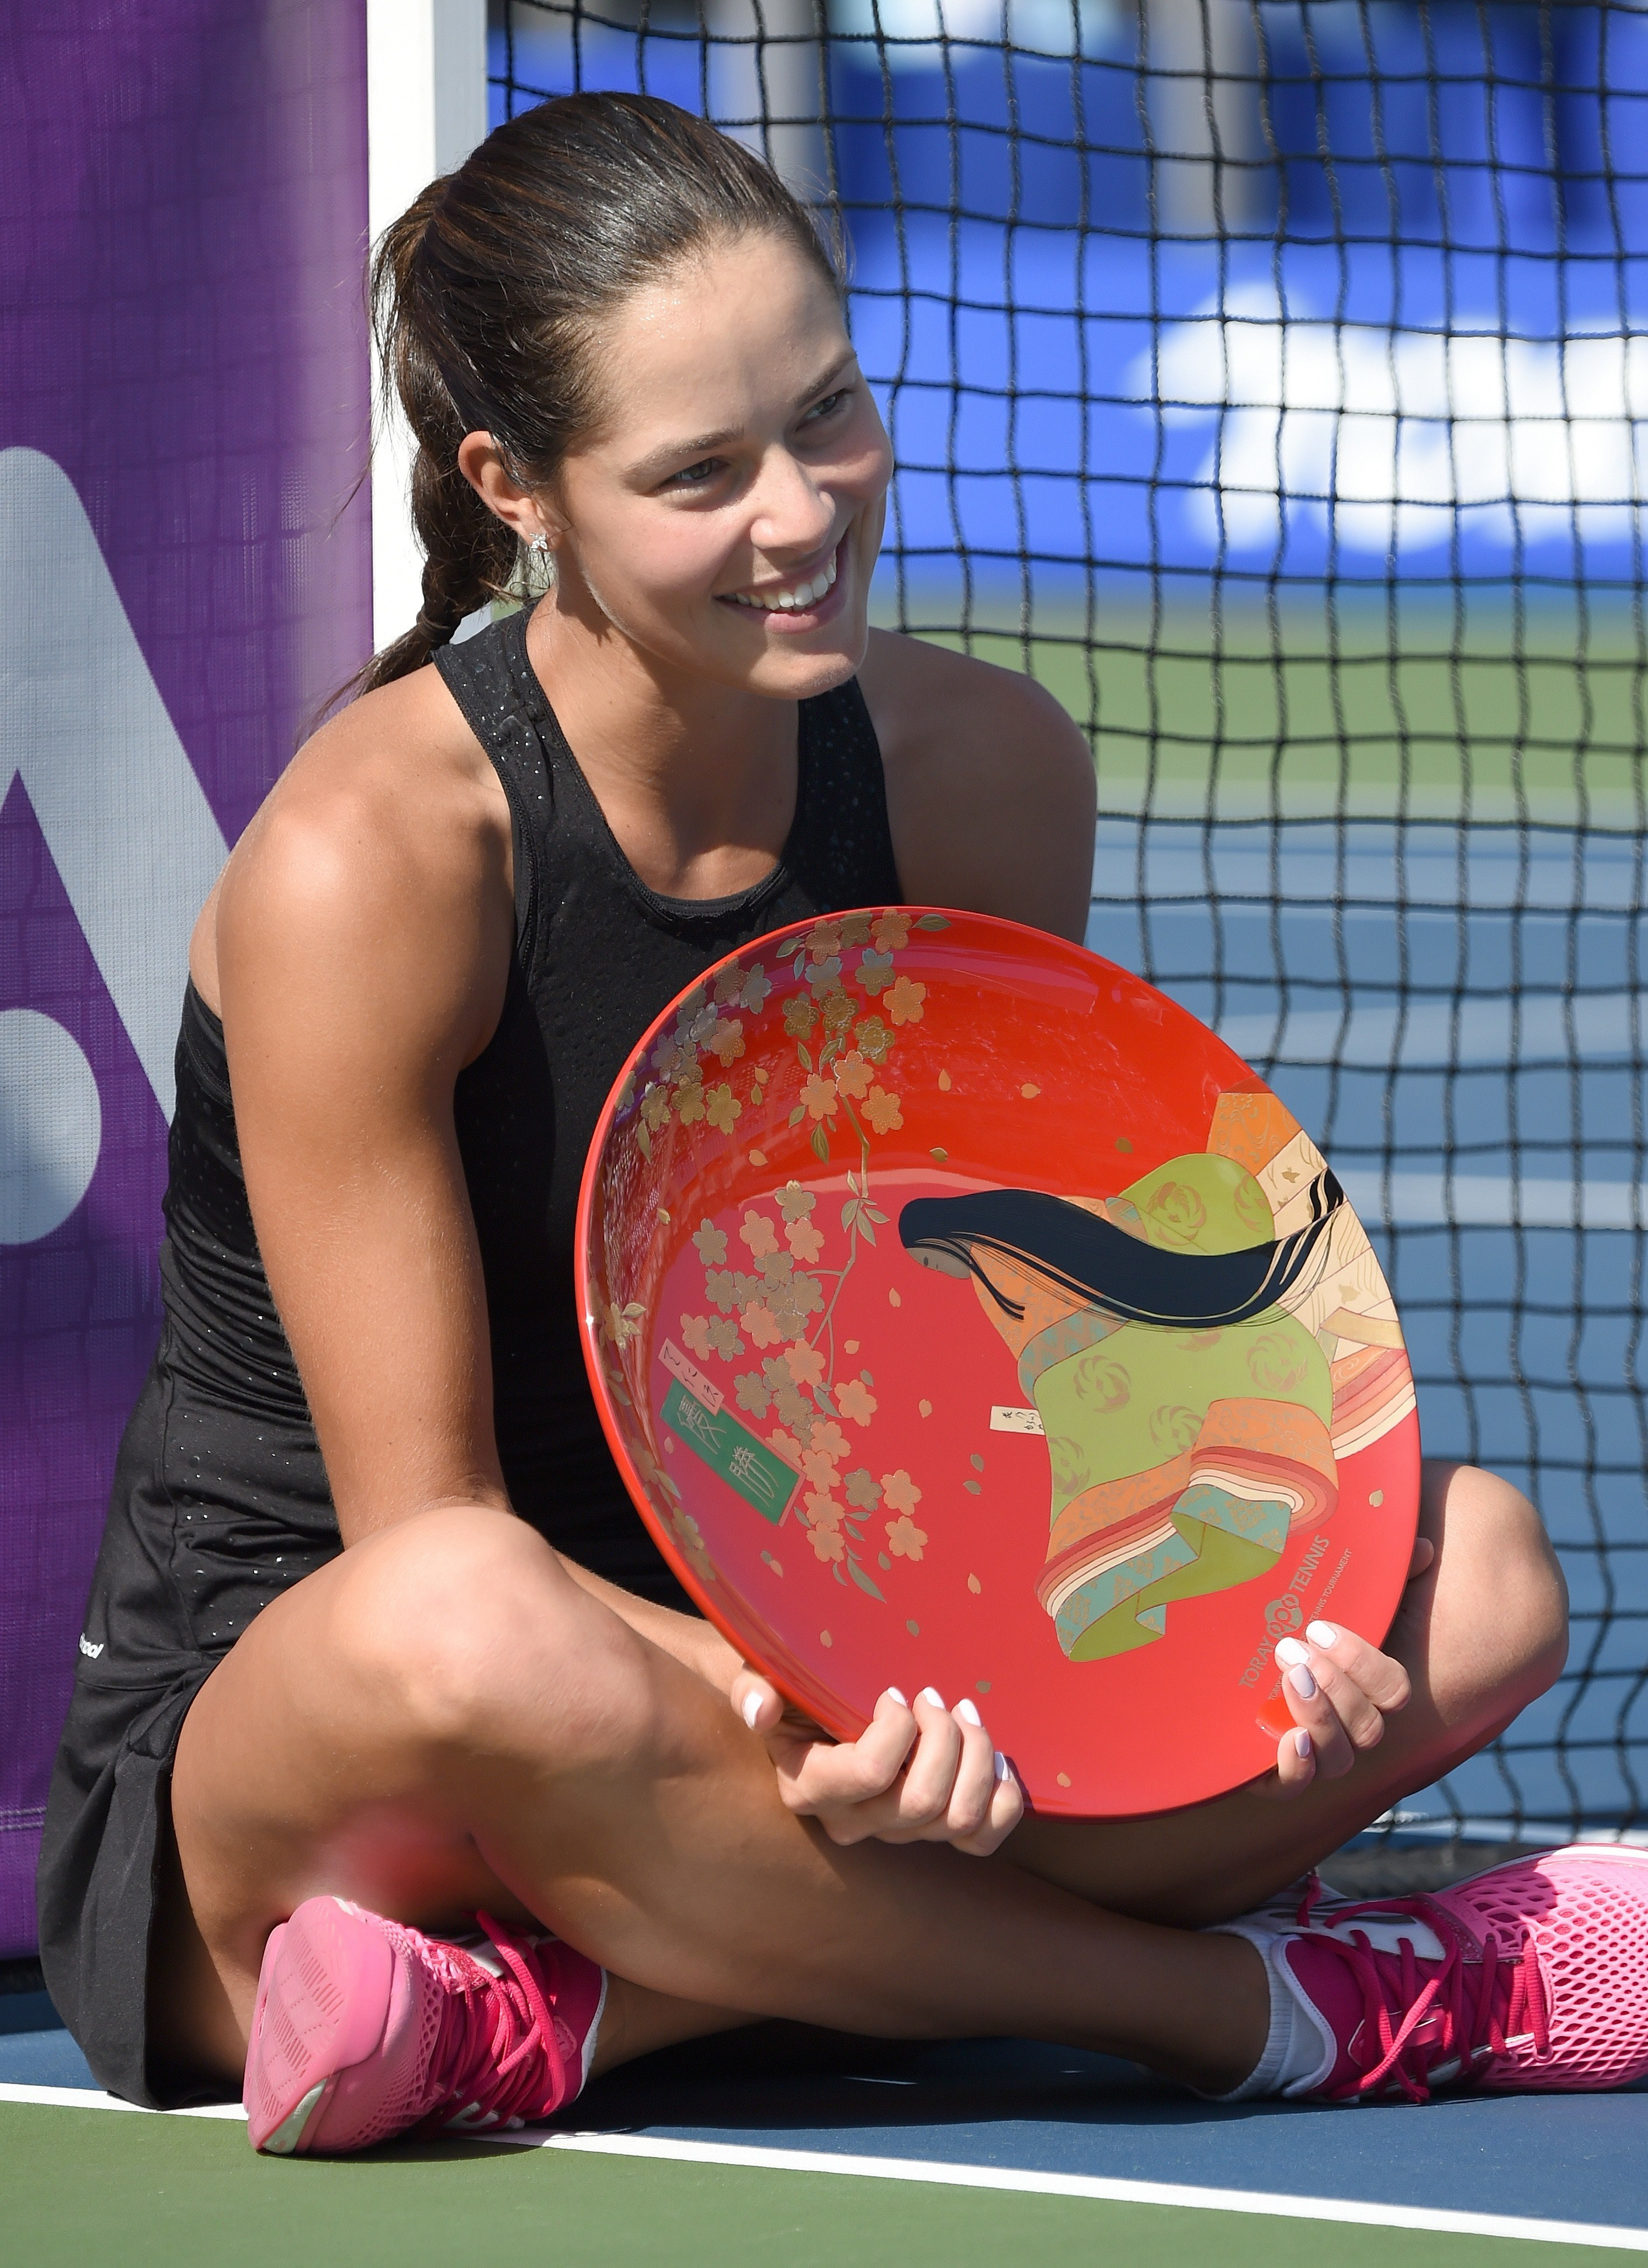 Ana Ivanovic wins the title, defeating Caroline Wozniacki in the final match.